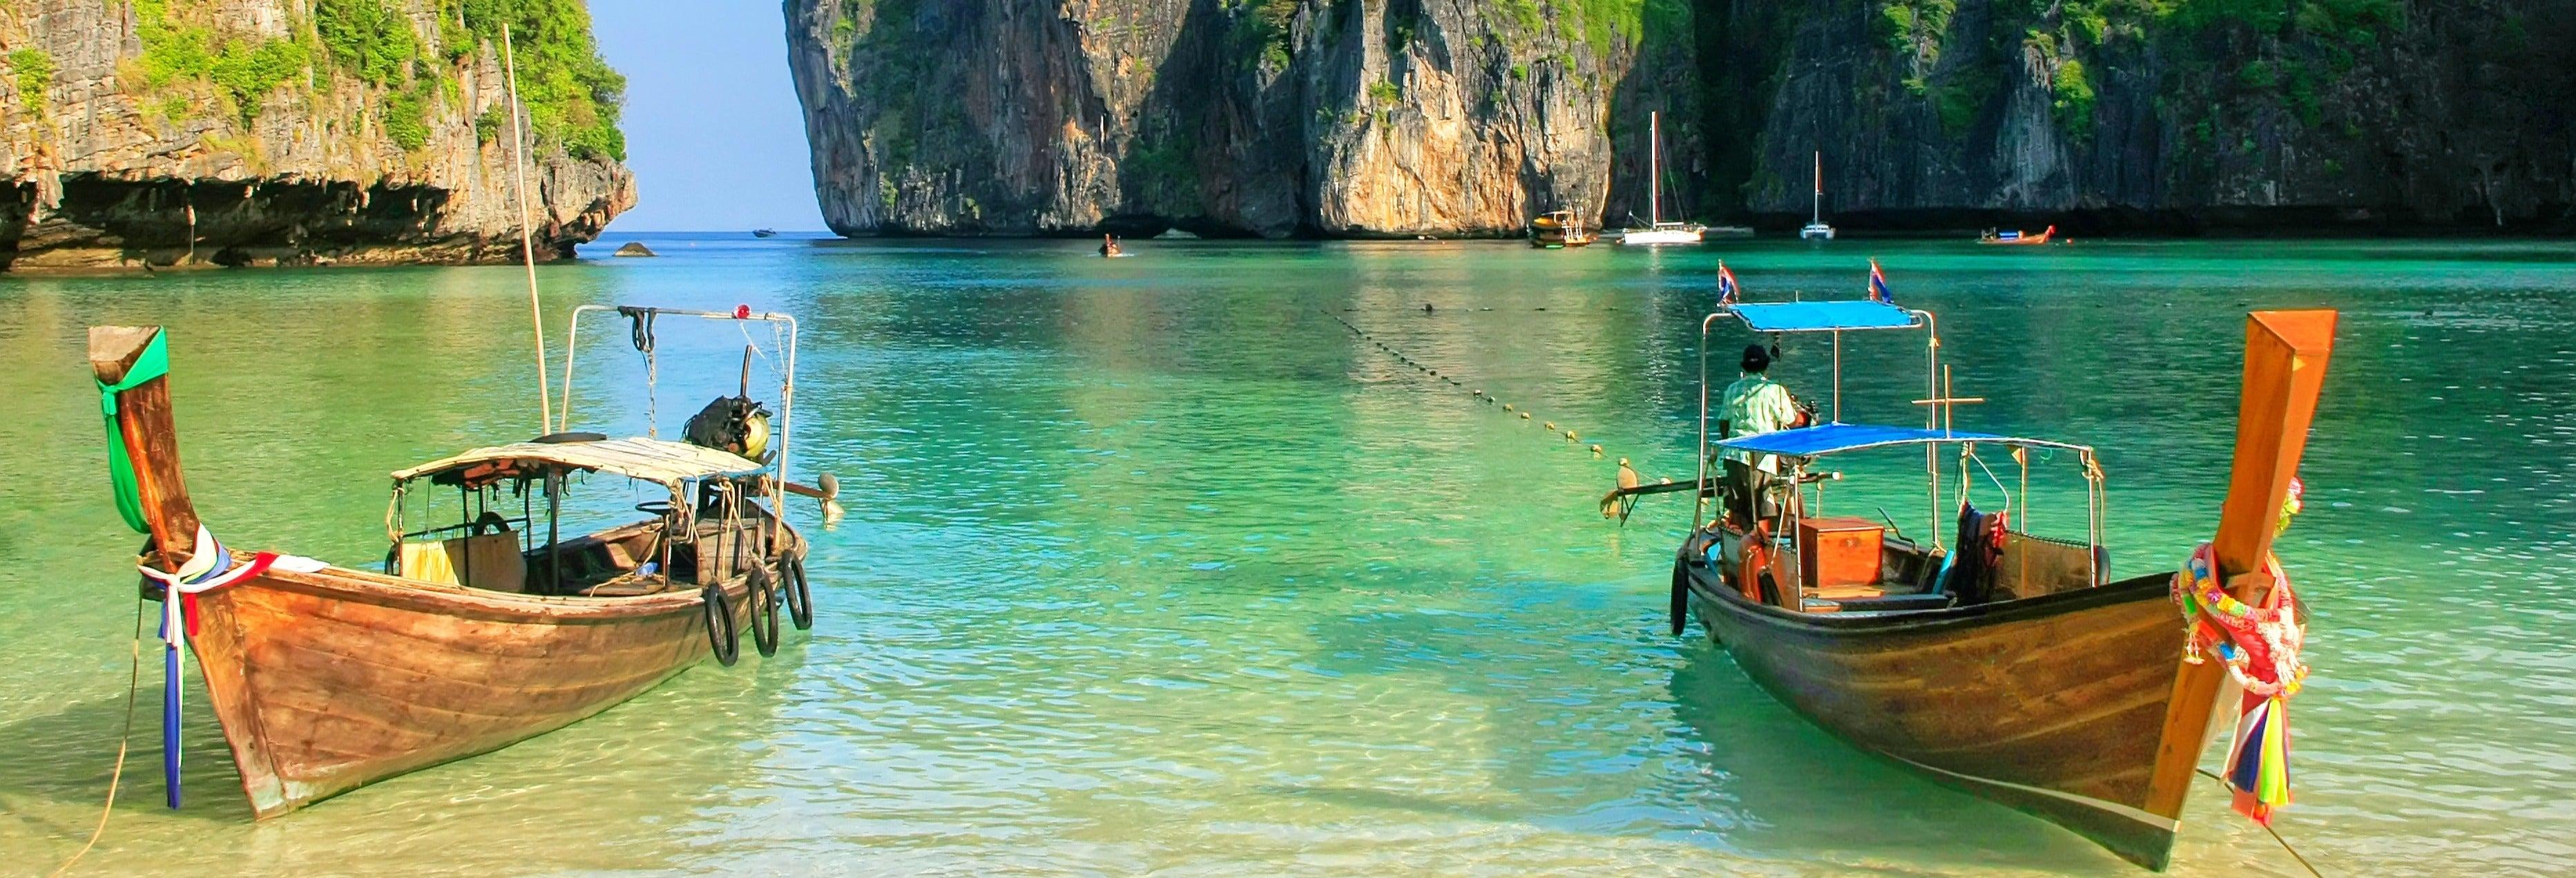 Traghetto per le isole Phi Phi